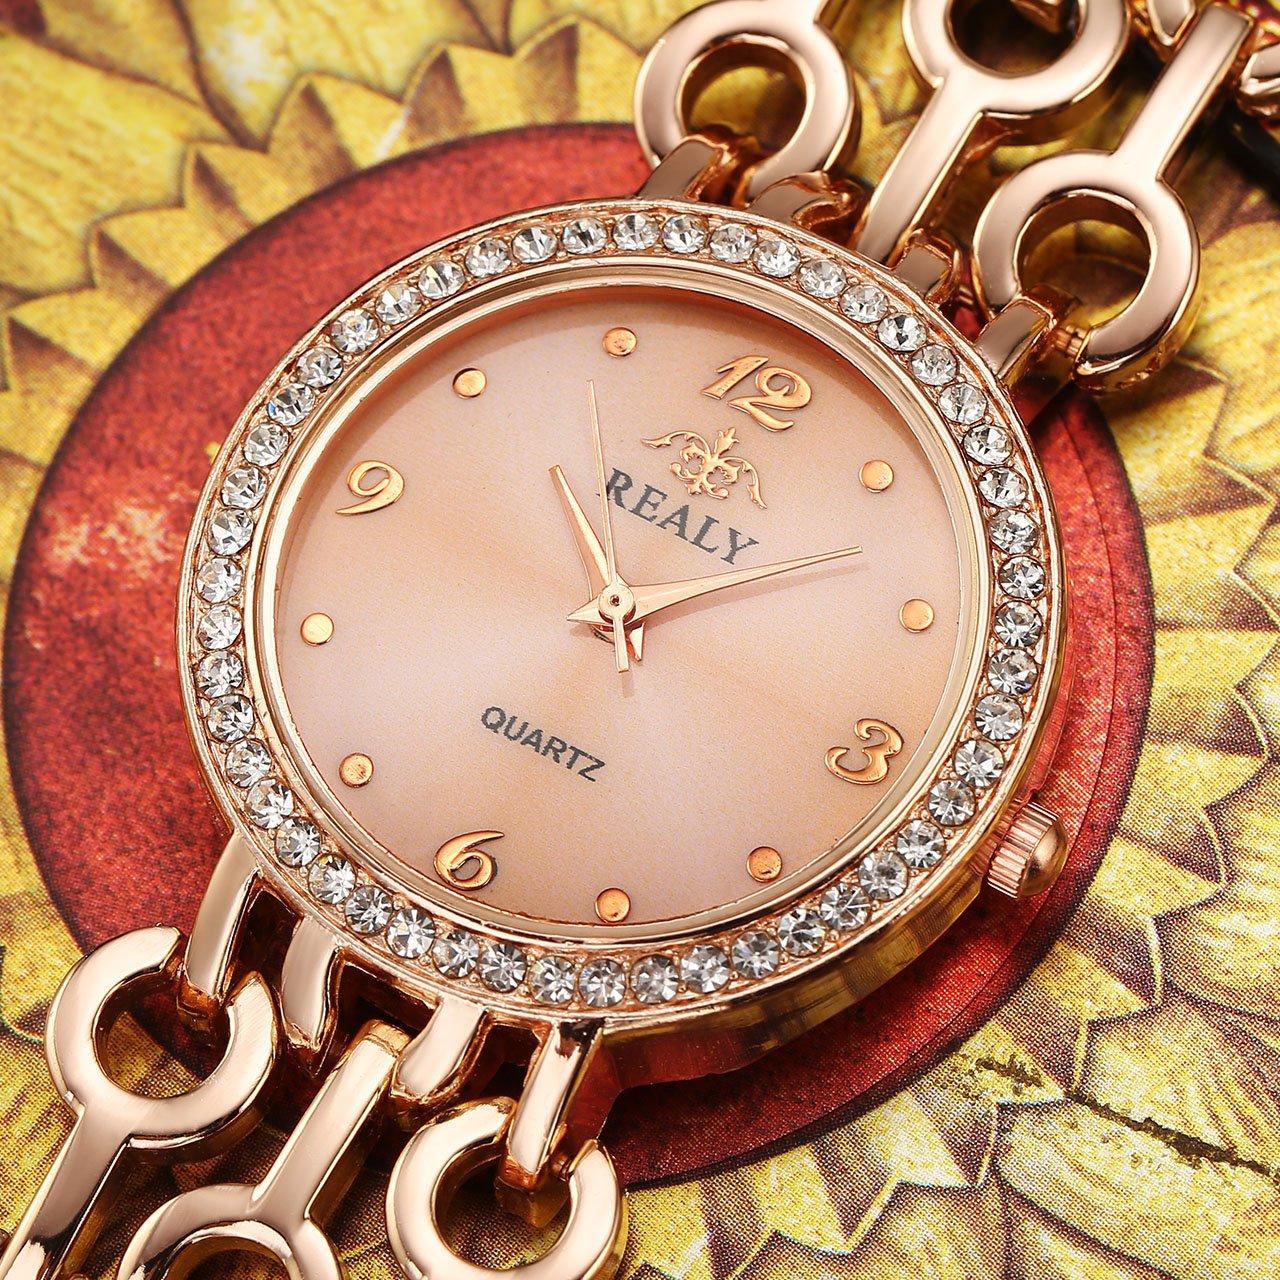 Top Plaza Women Elegant Fashion Bracelet Analog Quartz Watch Rose Gold Tone Rhinestone Case Big Face Large Dial Wide Band Waterproof Cuff Watch by Top Plaza (Image #6)